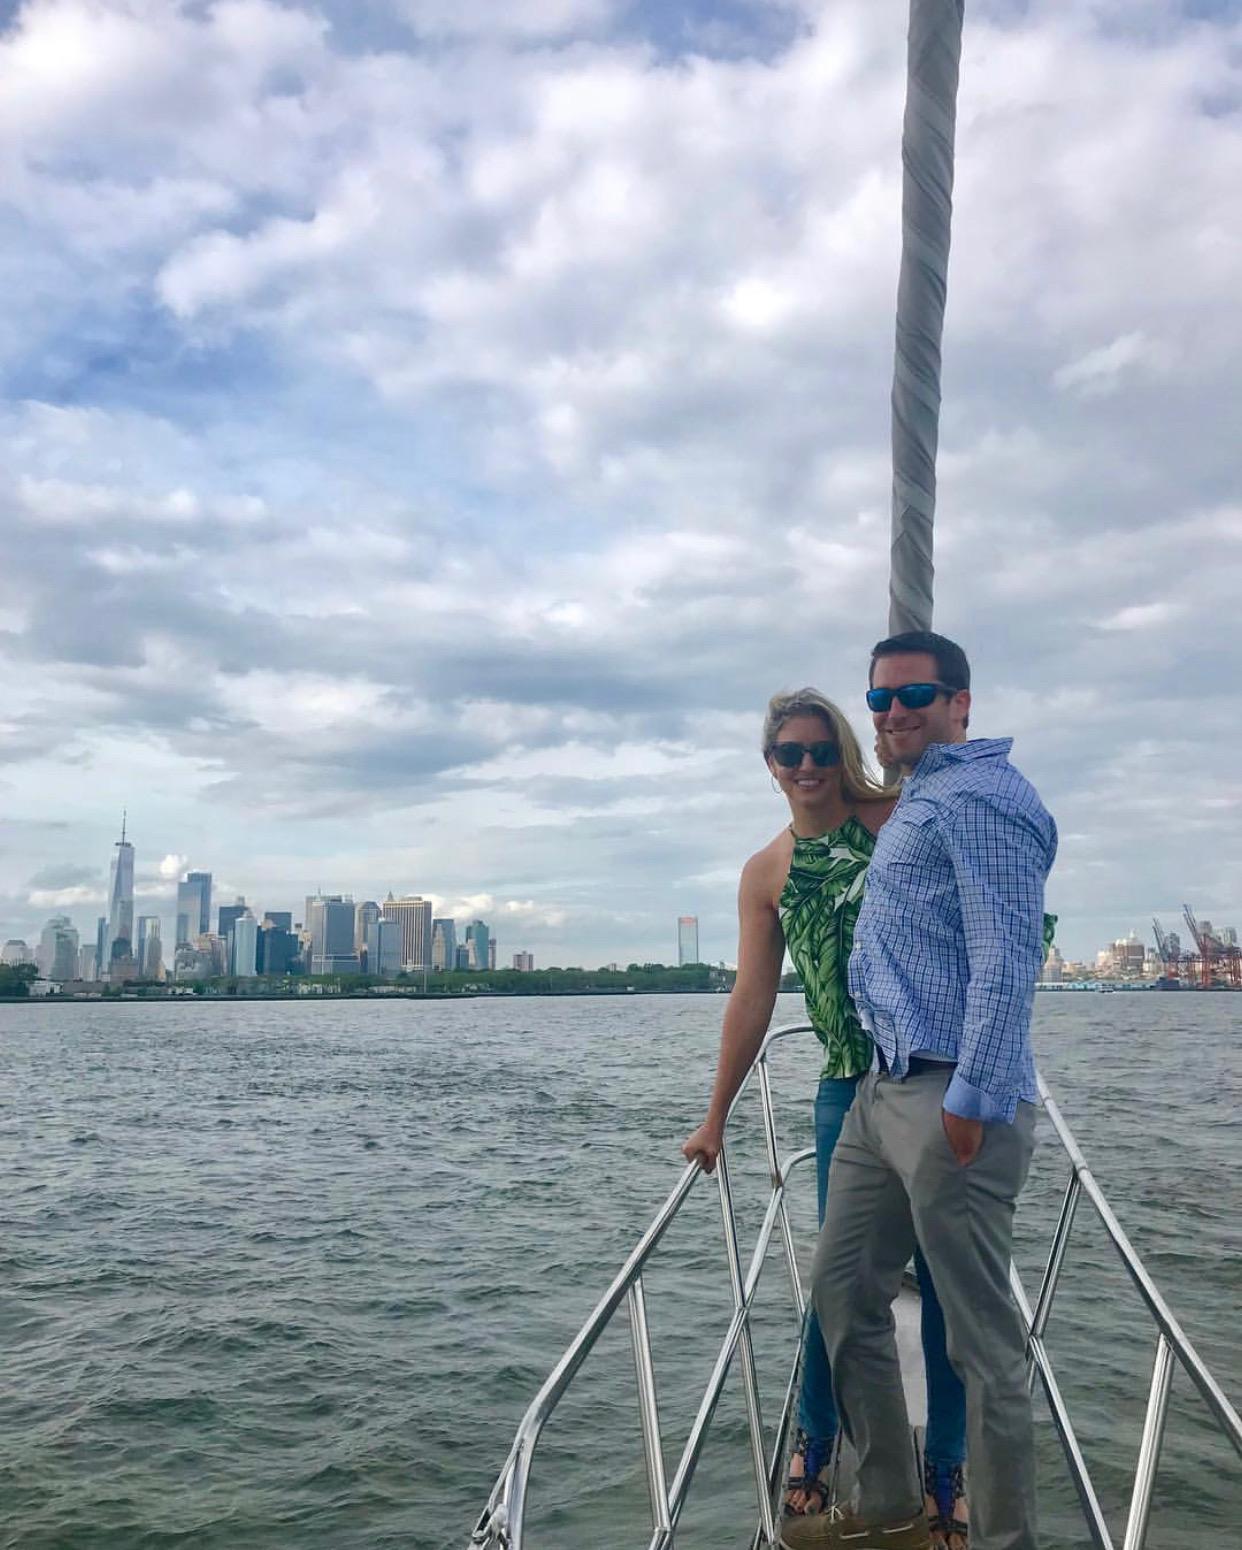 New York Harbor, May 2018